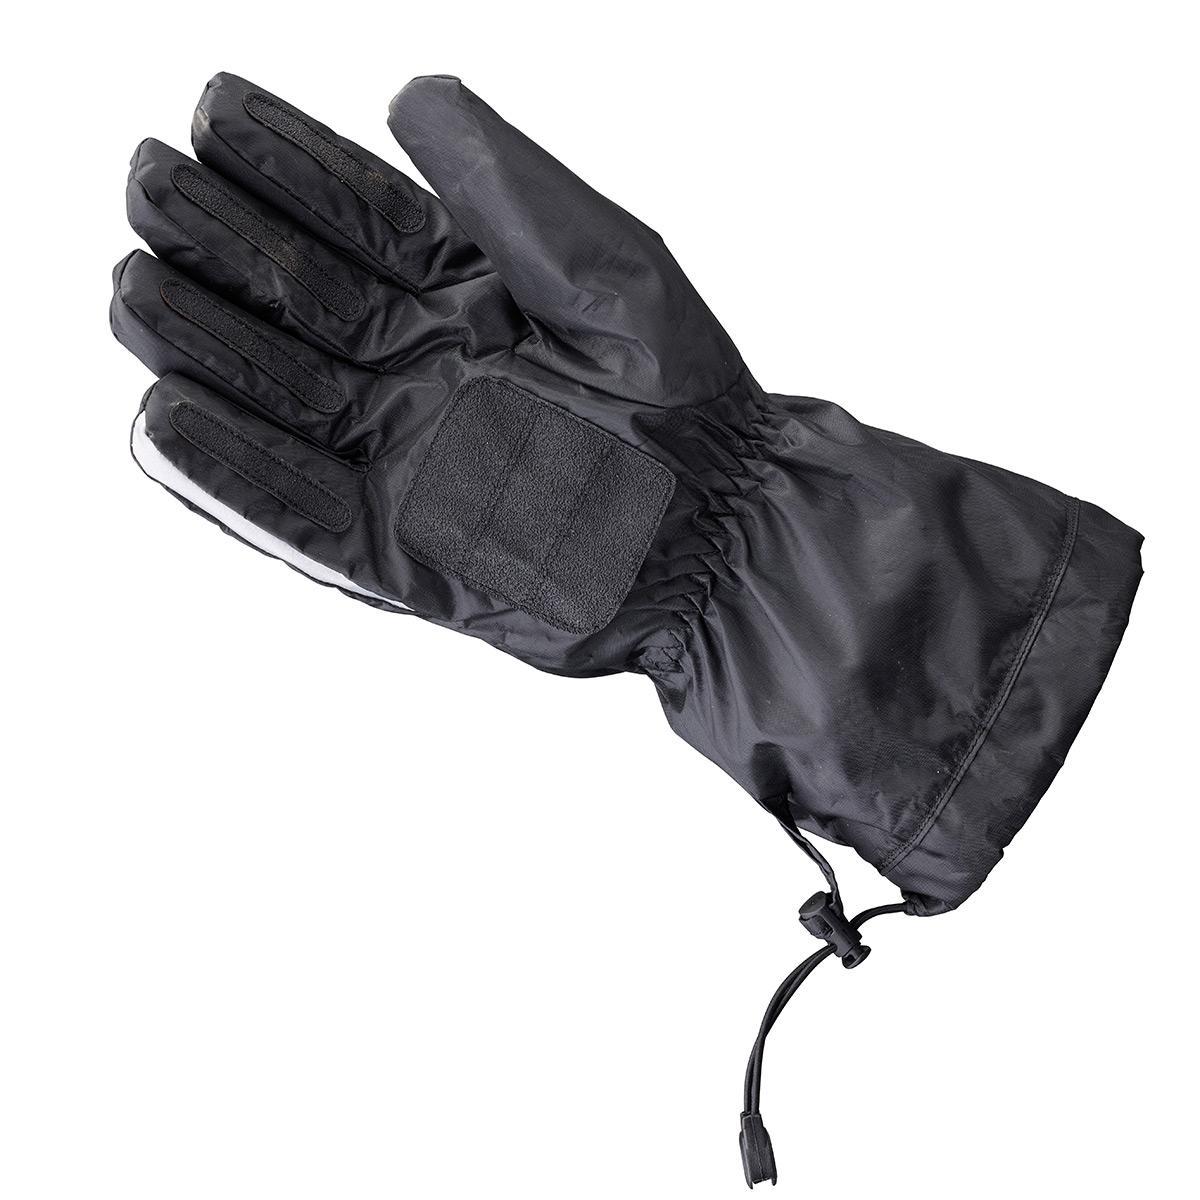 Winter Motorcycle Gloves >> Hevik HCW100 Waterproof and Windproof Motorcycle Over Gloves - Black | eBay